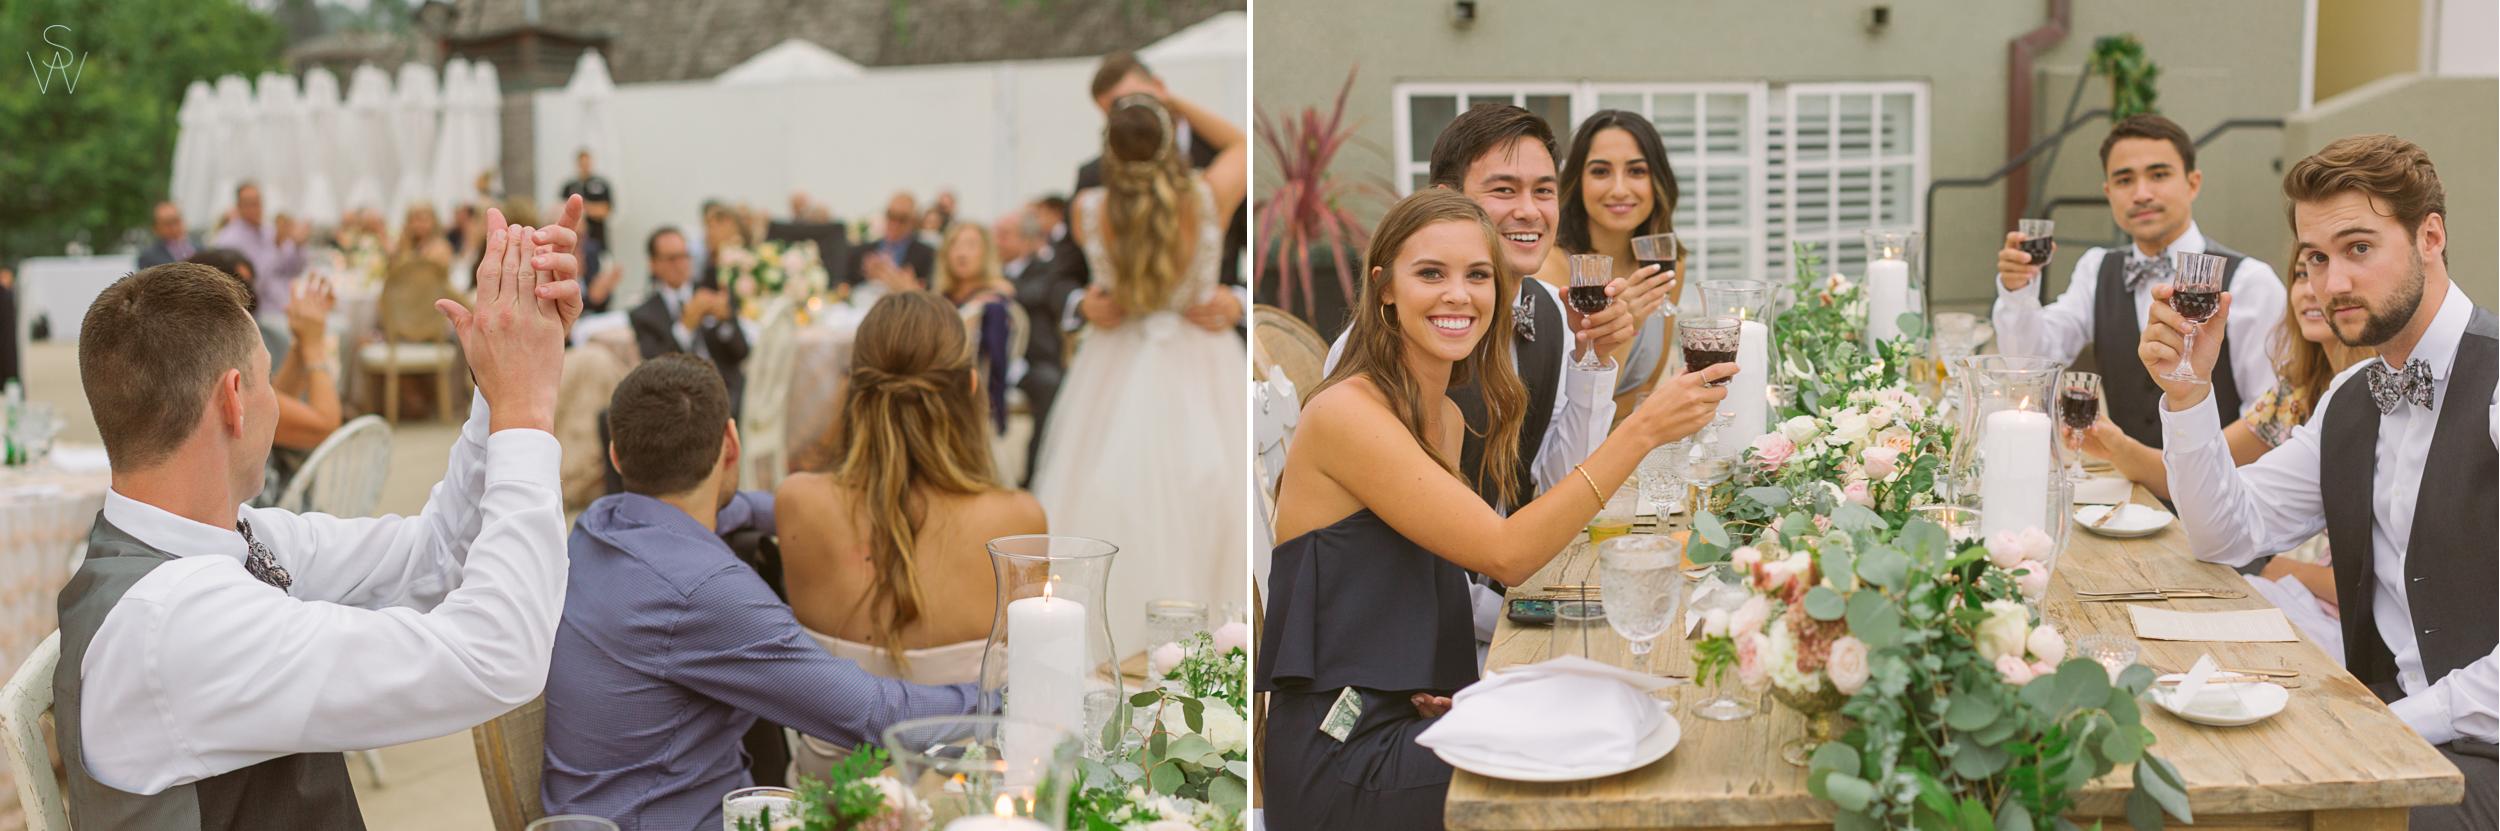 217Lauberge.shewanders.wedding.photography.JPG